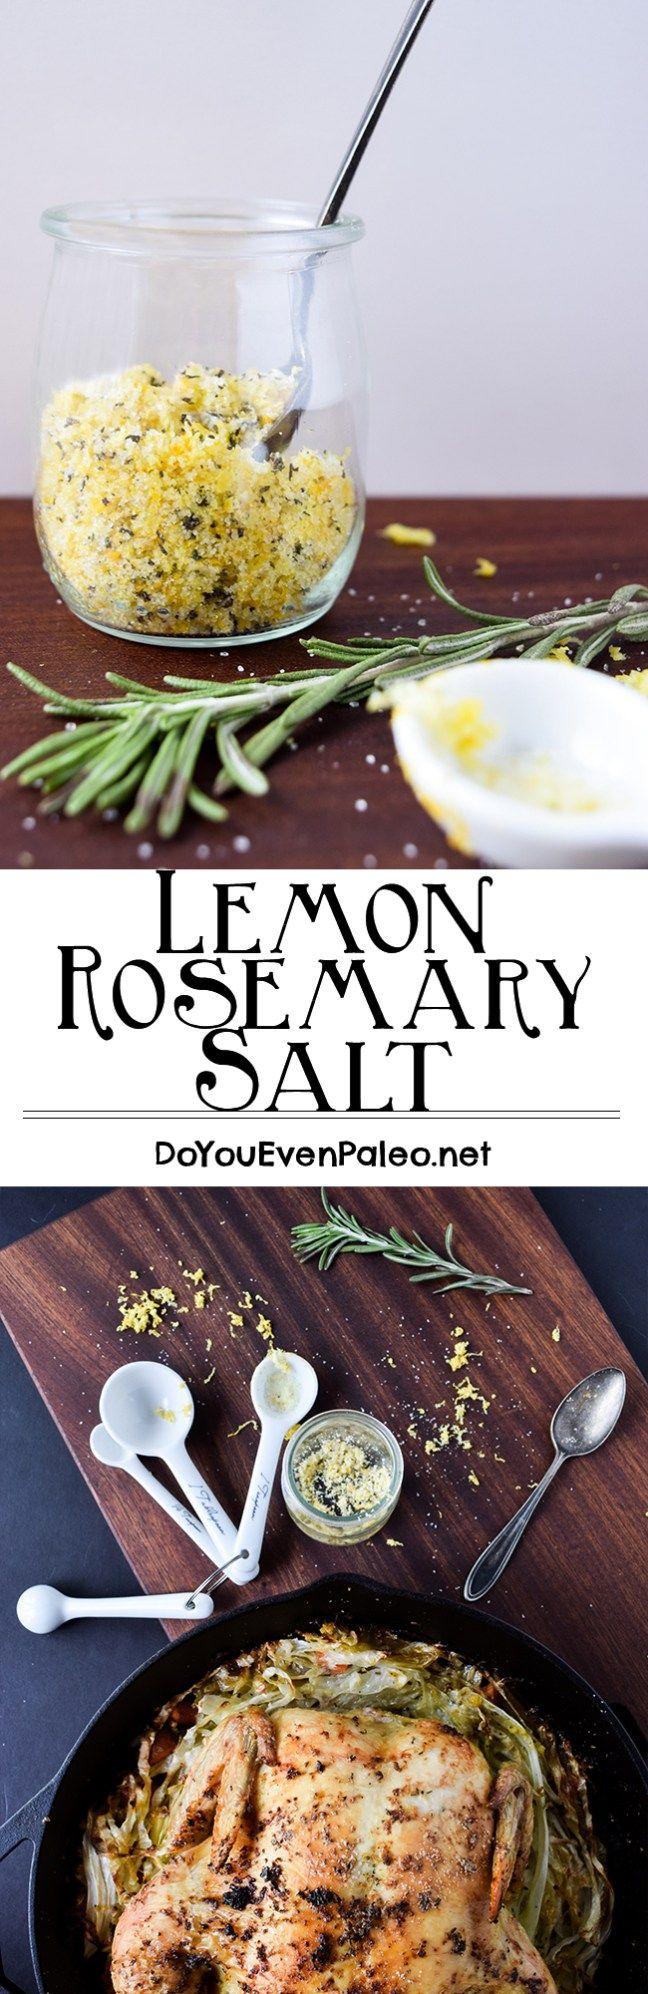 Lemon Rosemary Salt - a 3-ingredient salt blend with a variety of uses! Rub it on chicken, pork, or fish. Sprinkle on roasted veggies. Simple! | DoYouEvenPaleo.net